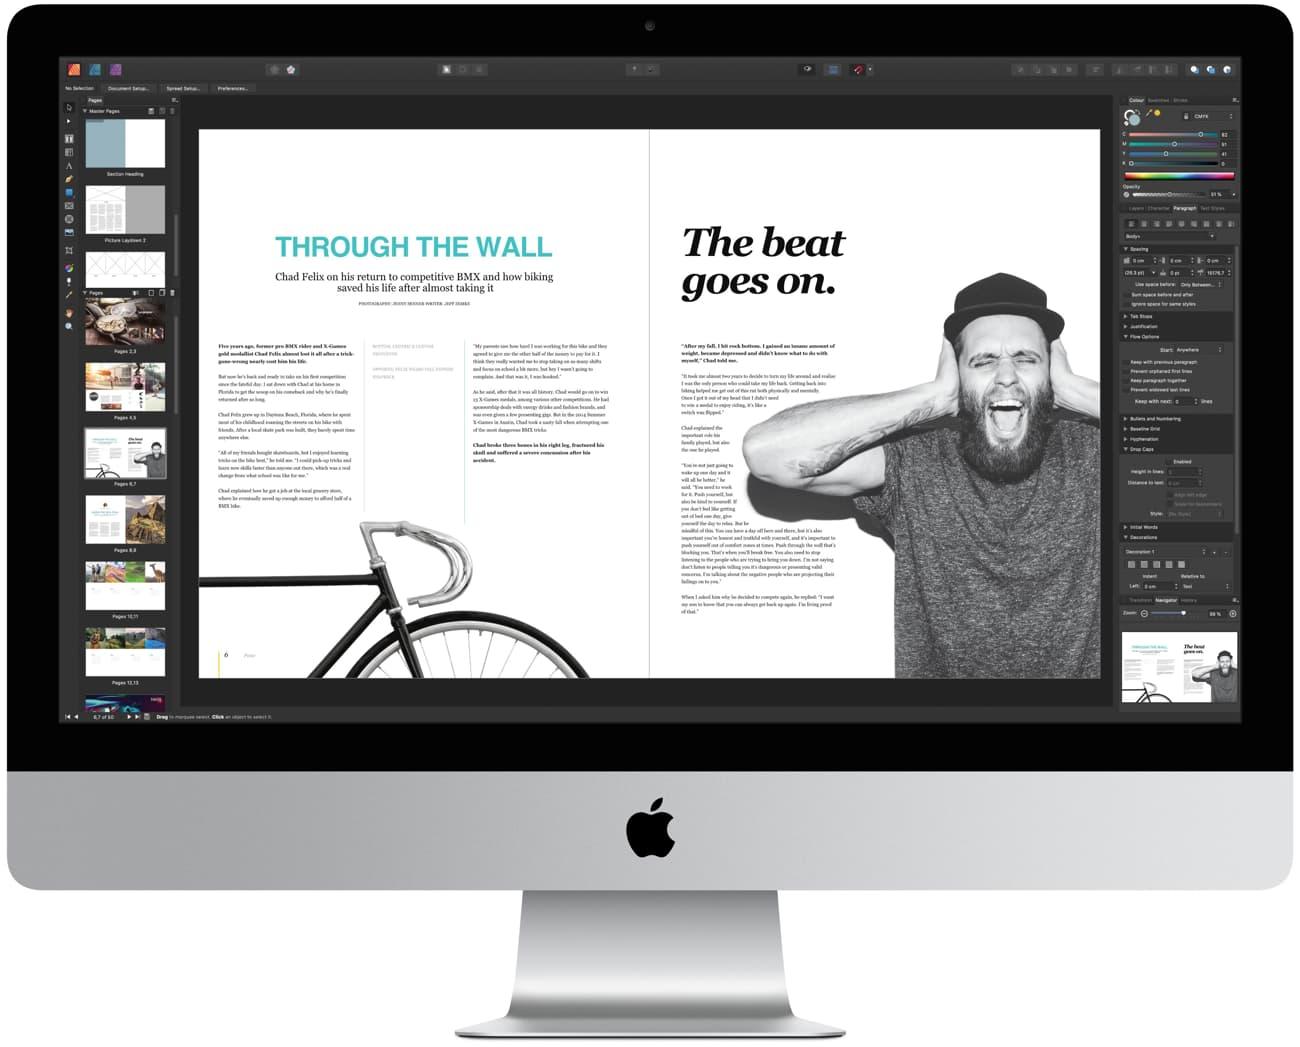 Serif lance AffinityPublisher, doté de l'incroyable nouvelle technologie StudioLink